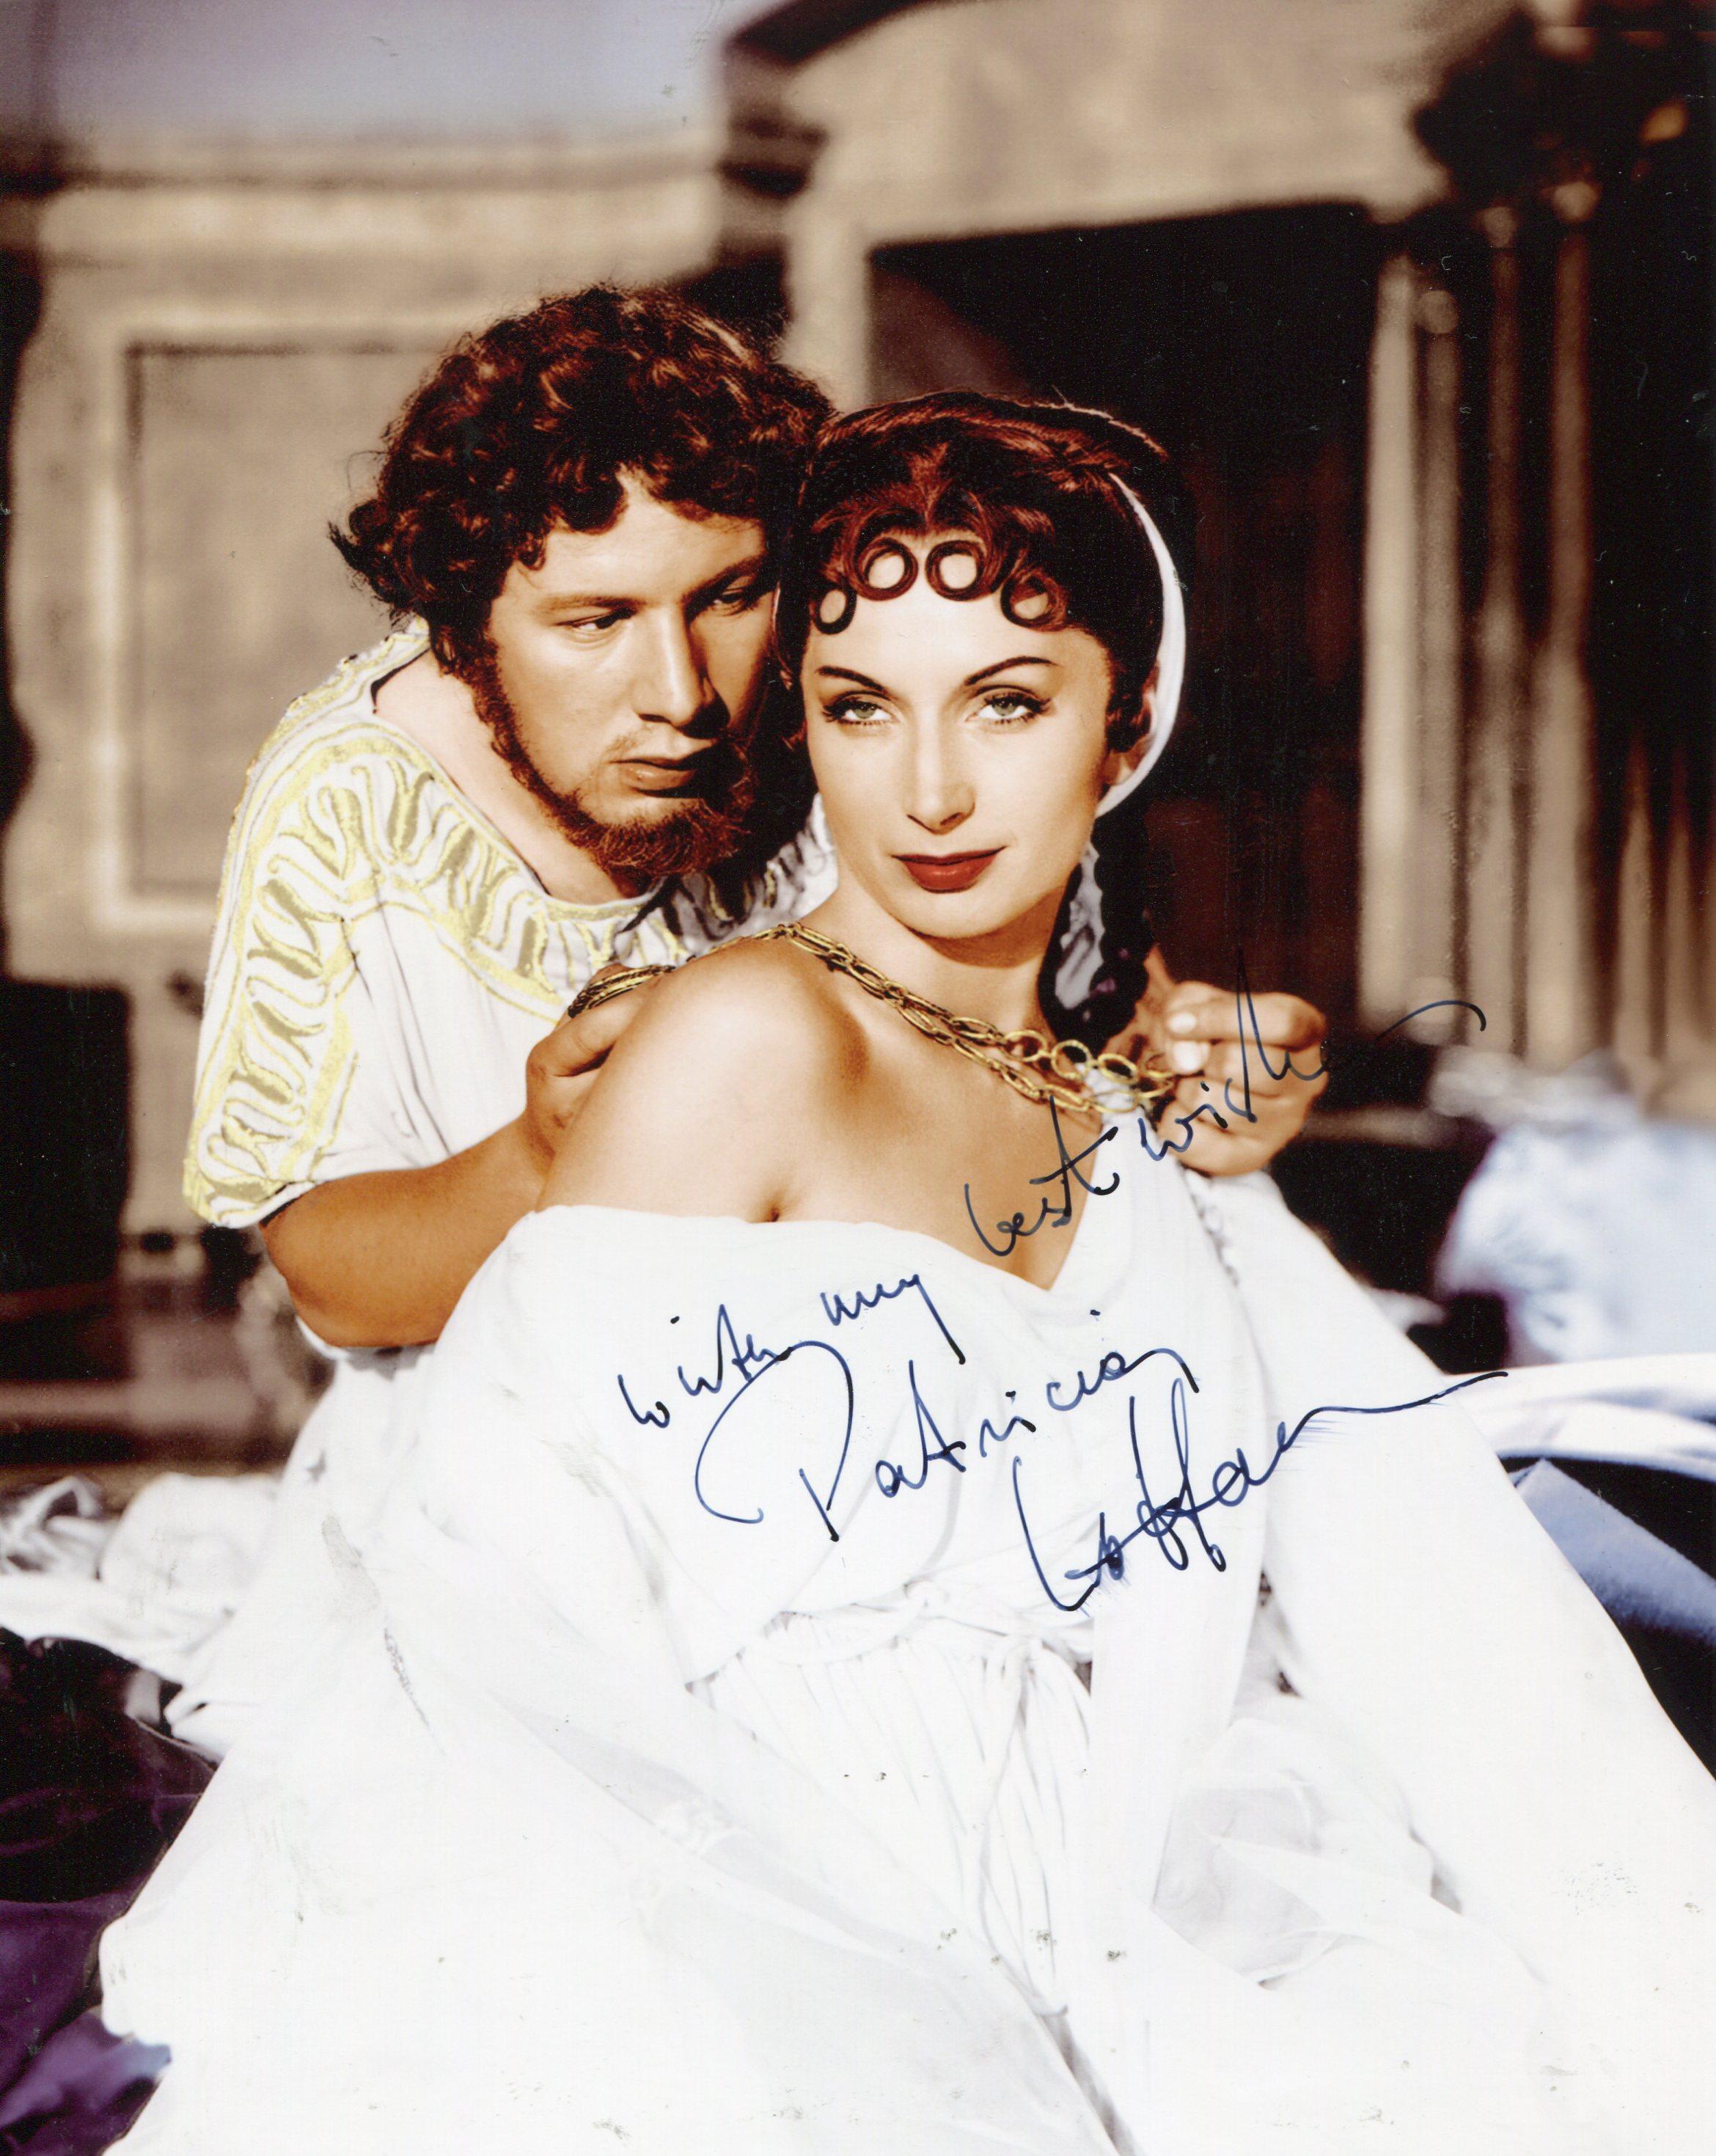 Patricia Laffan - Movies & Autographed Portraits Through ... Patricia Laffan Images